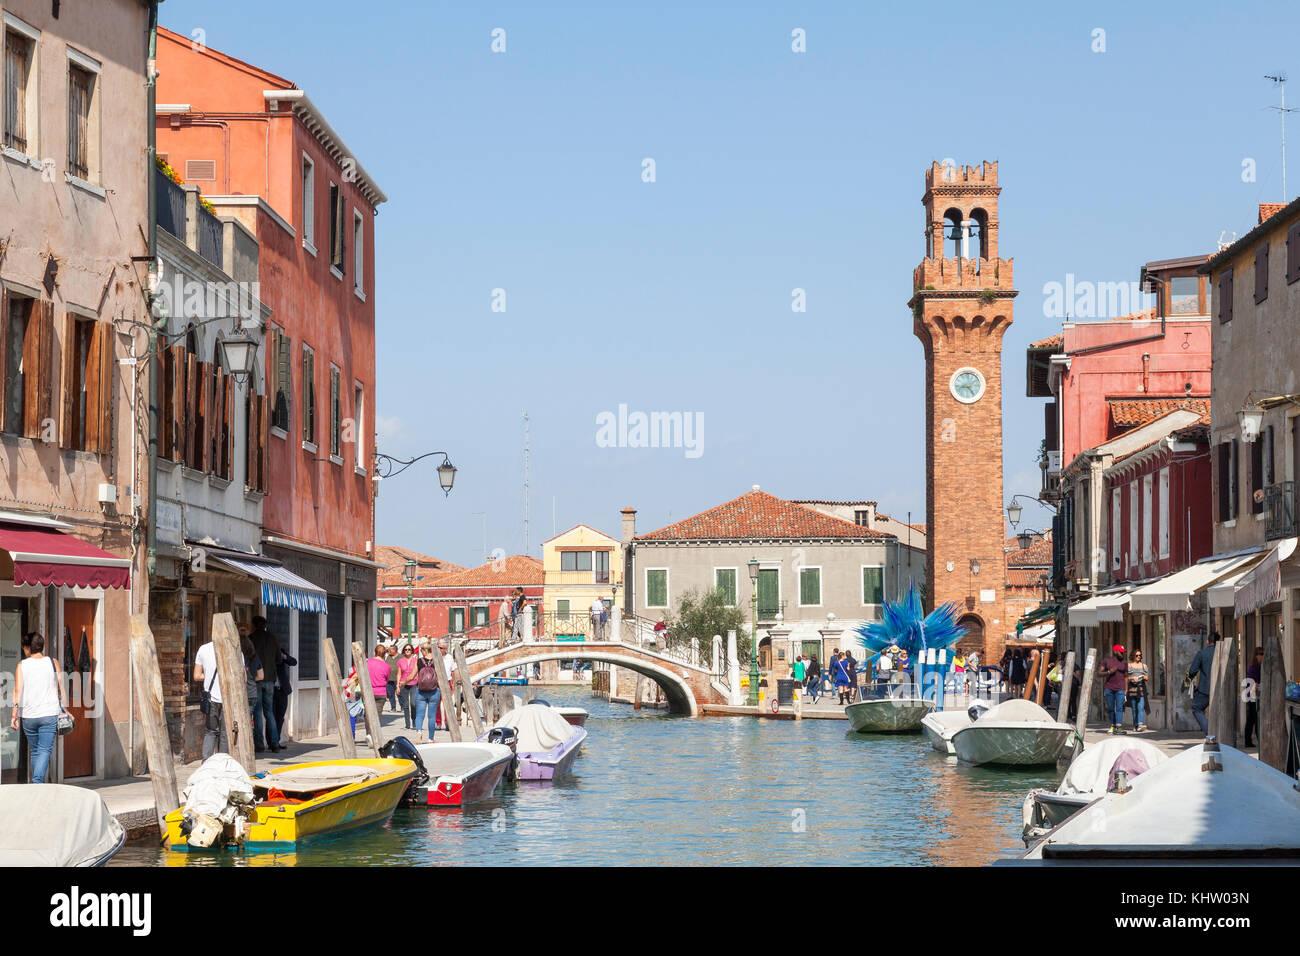 View up Rio dei Vetrai towards Campo San Stefano and the bell tower, Murano, Venice, Italy - Stock Image